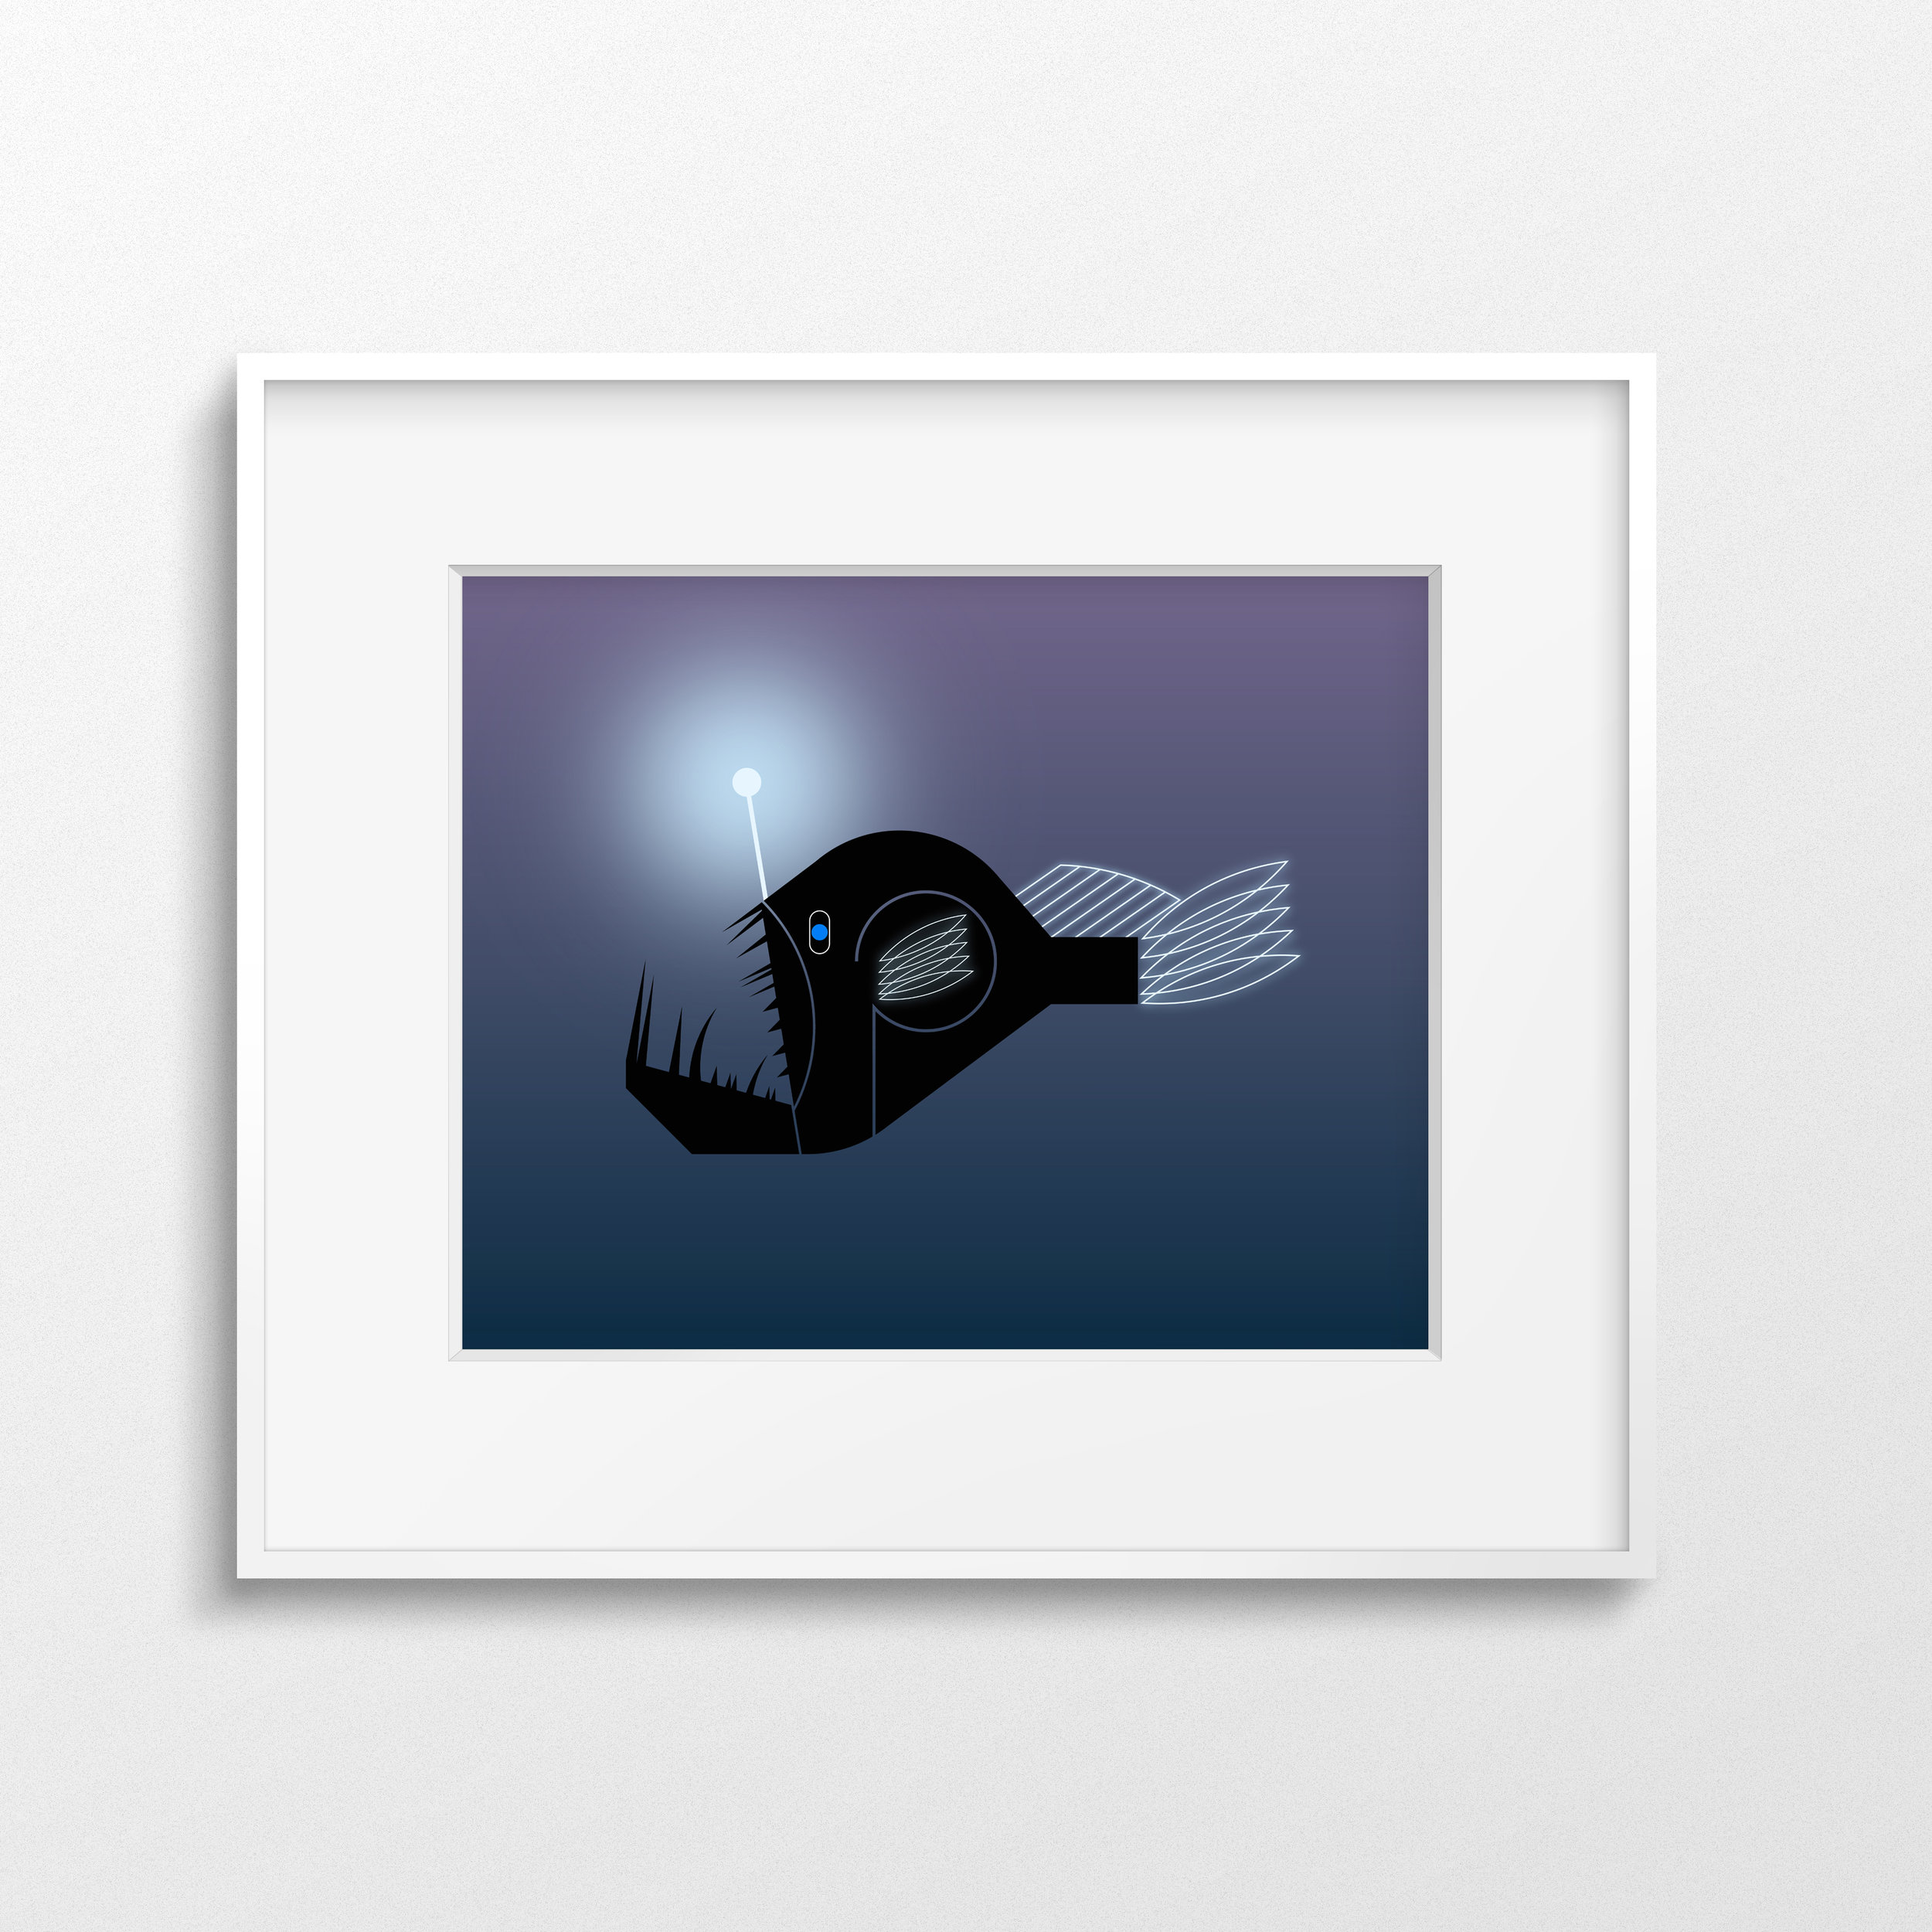 Angler Fish (8x10).jpg